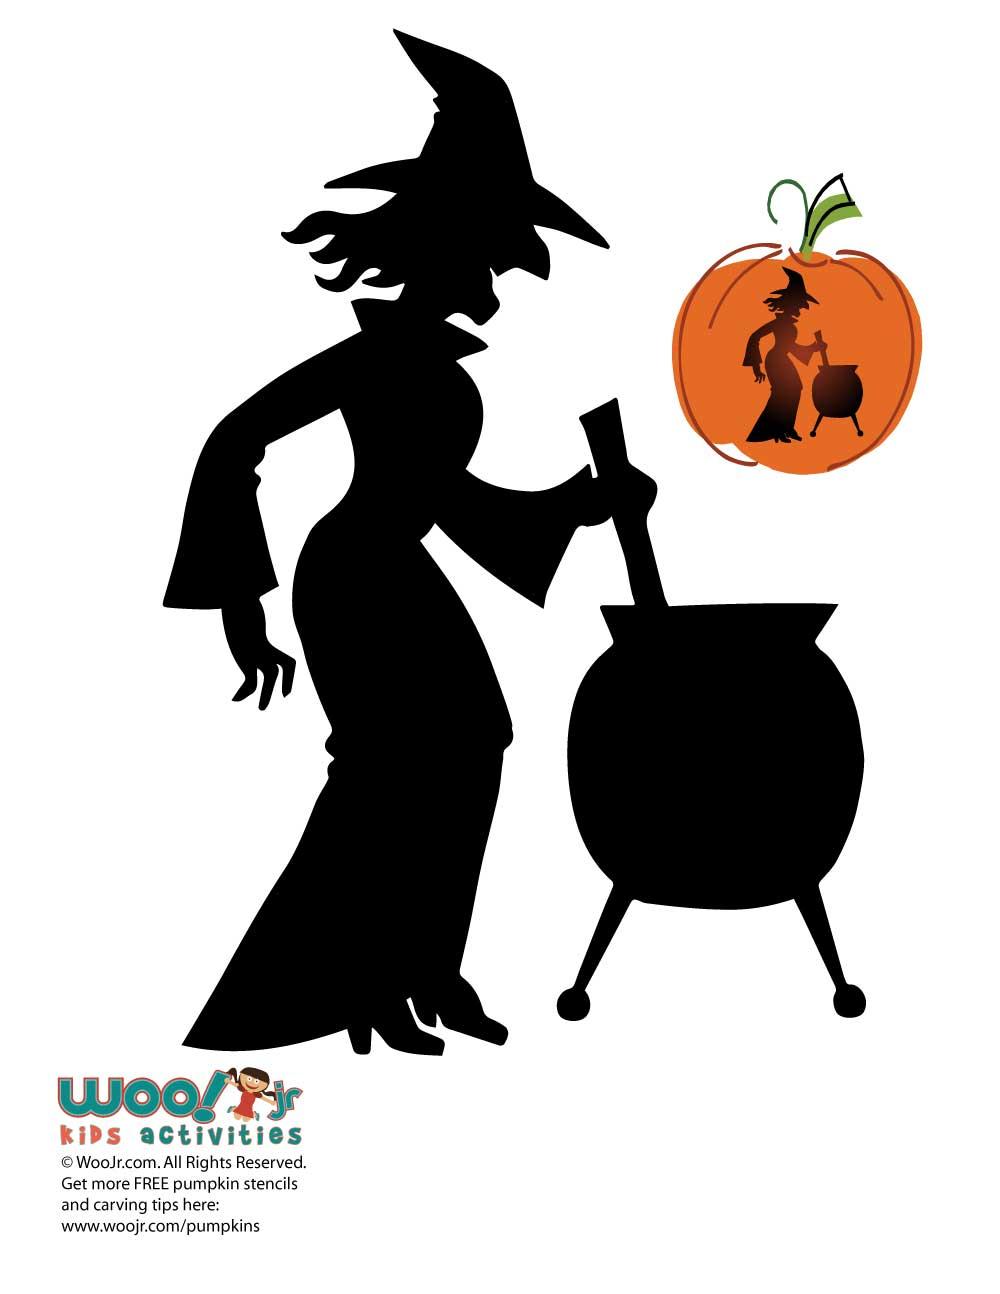 Free Printable Pumpkin Stencils Witch Caldron - 17.6.kaartenstemp.nl • - Scary Pumpkin Patterns Free Printable